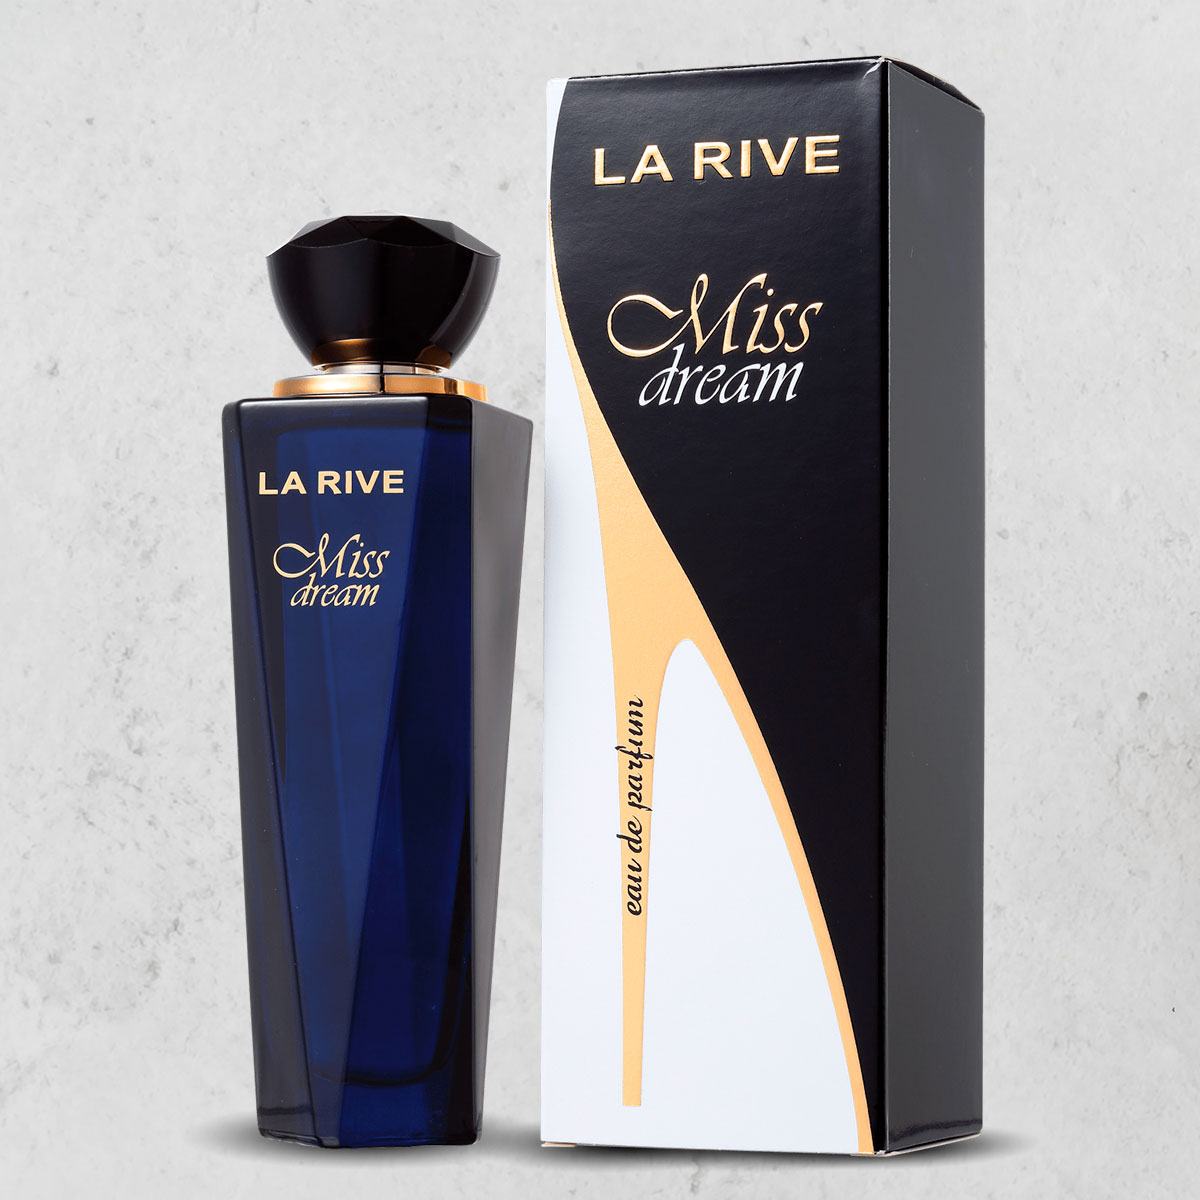 Kit 3 Perfumes Importados Femininos Miss Dream 100ml La Rive